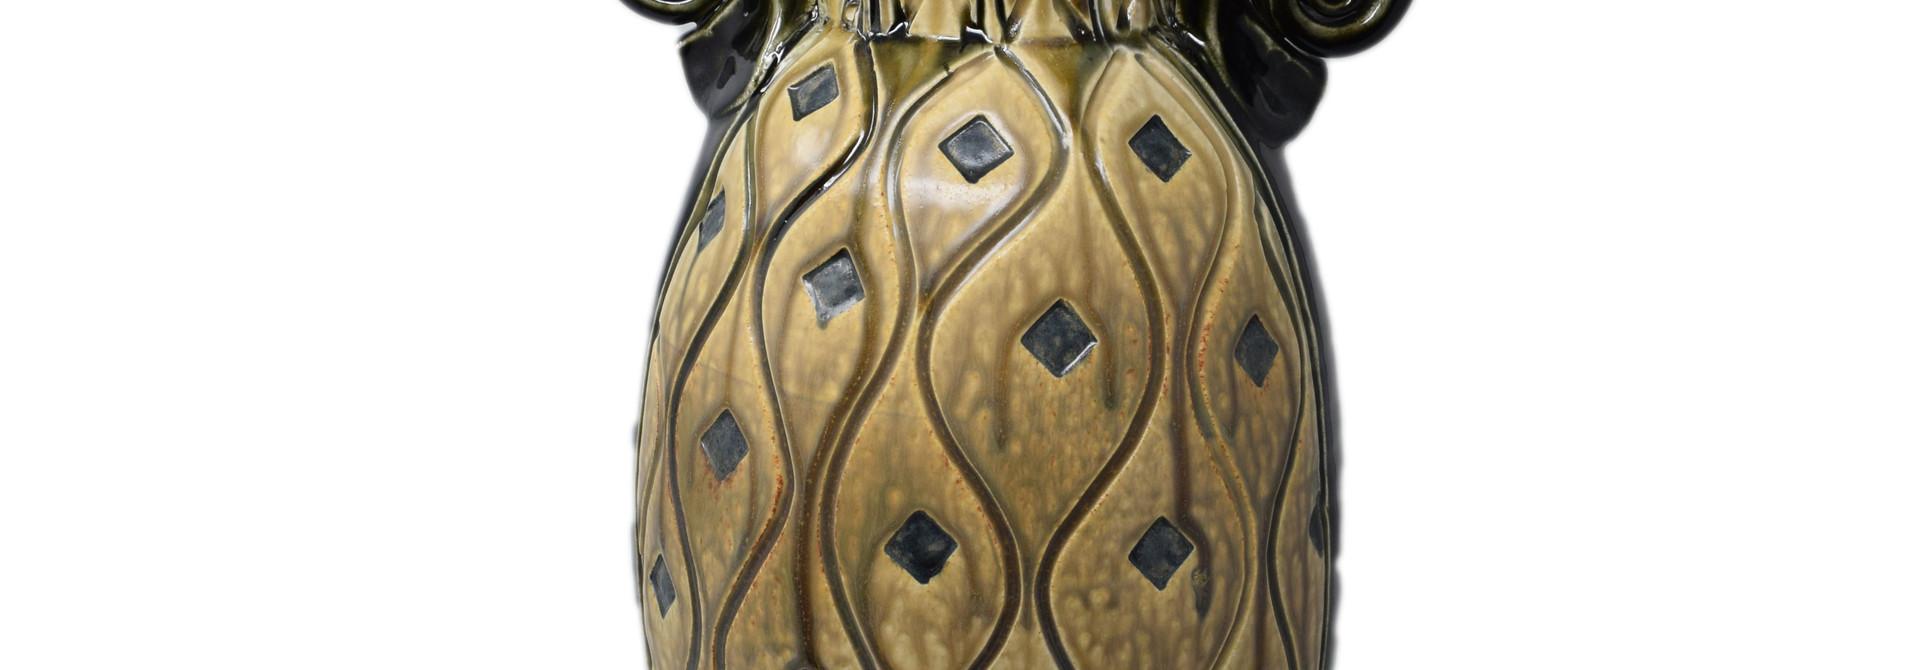 Large Vase w/Diamonds Black and Tan